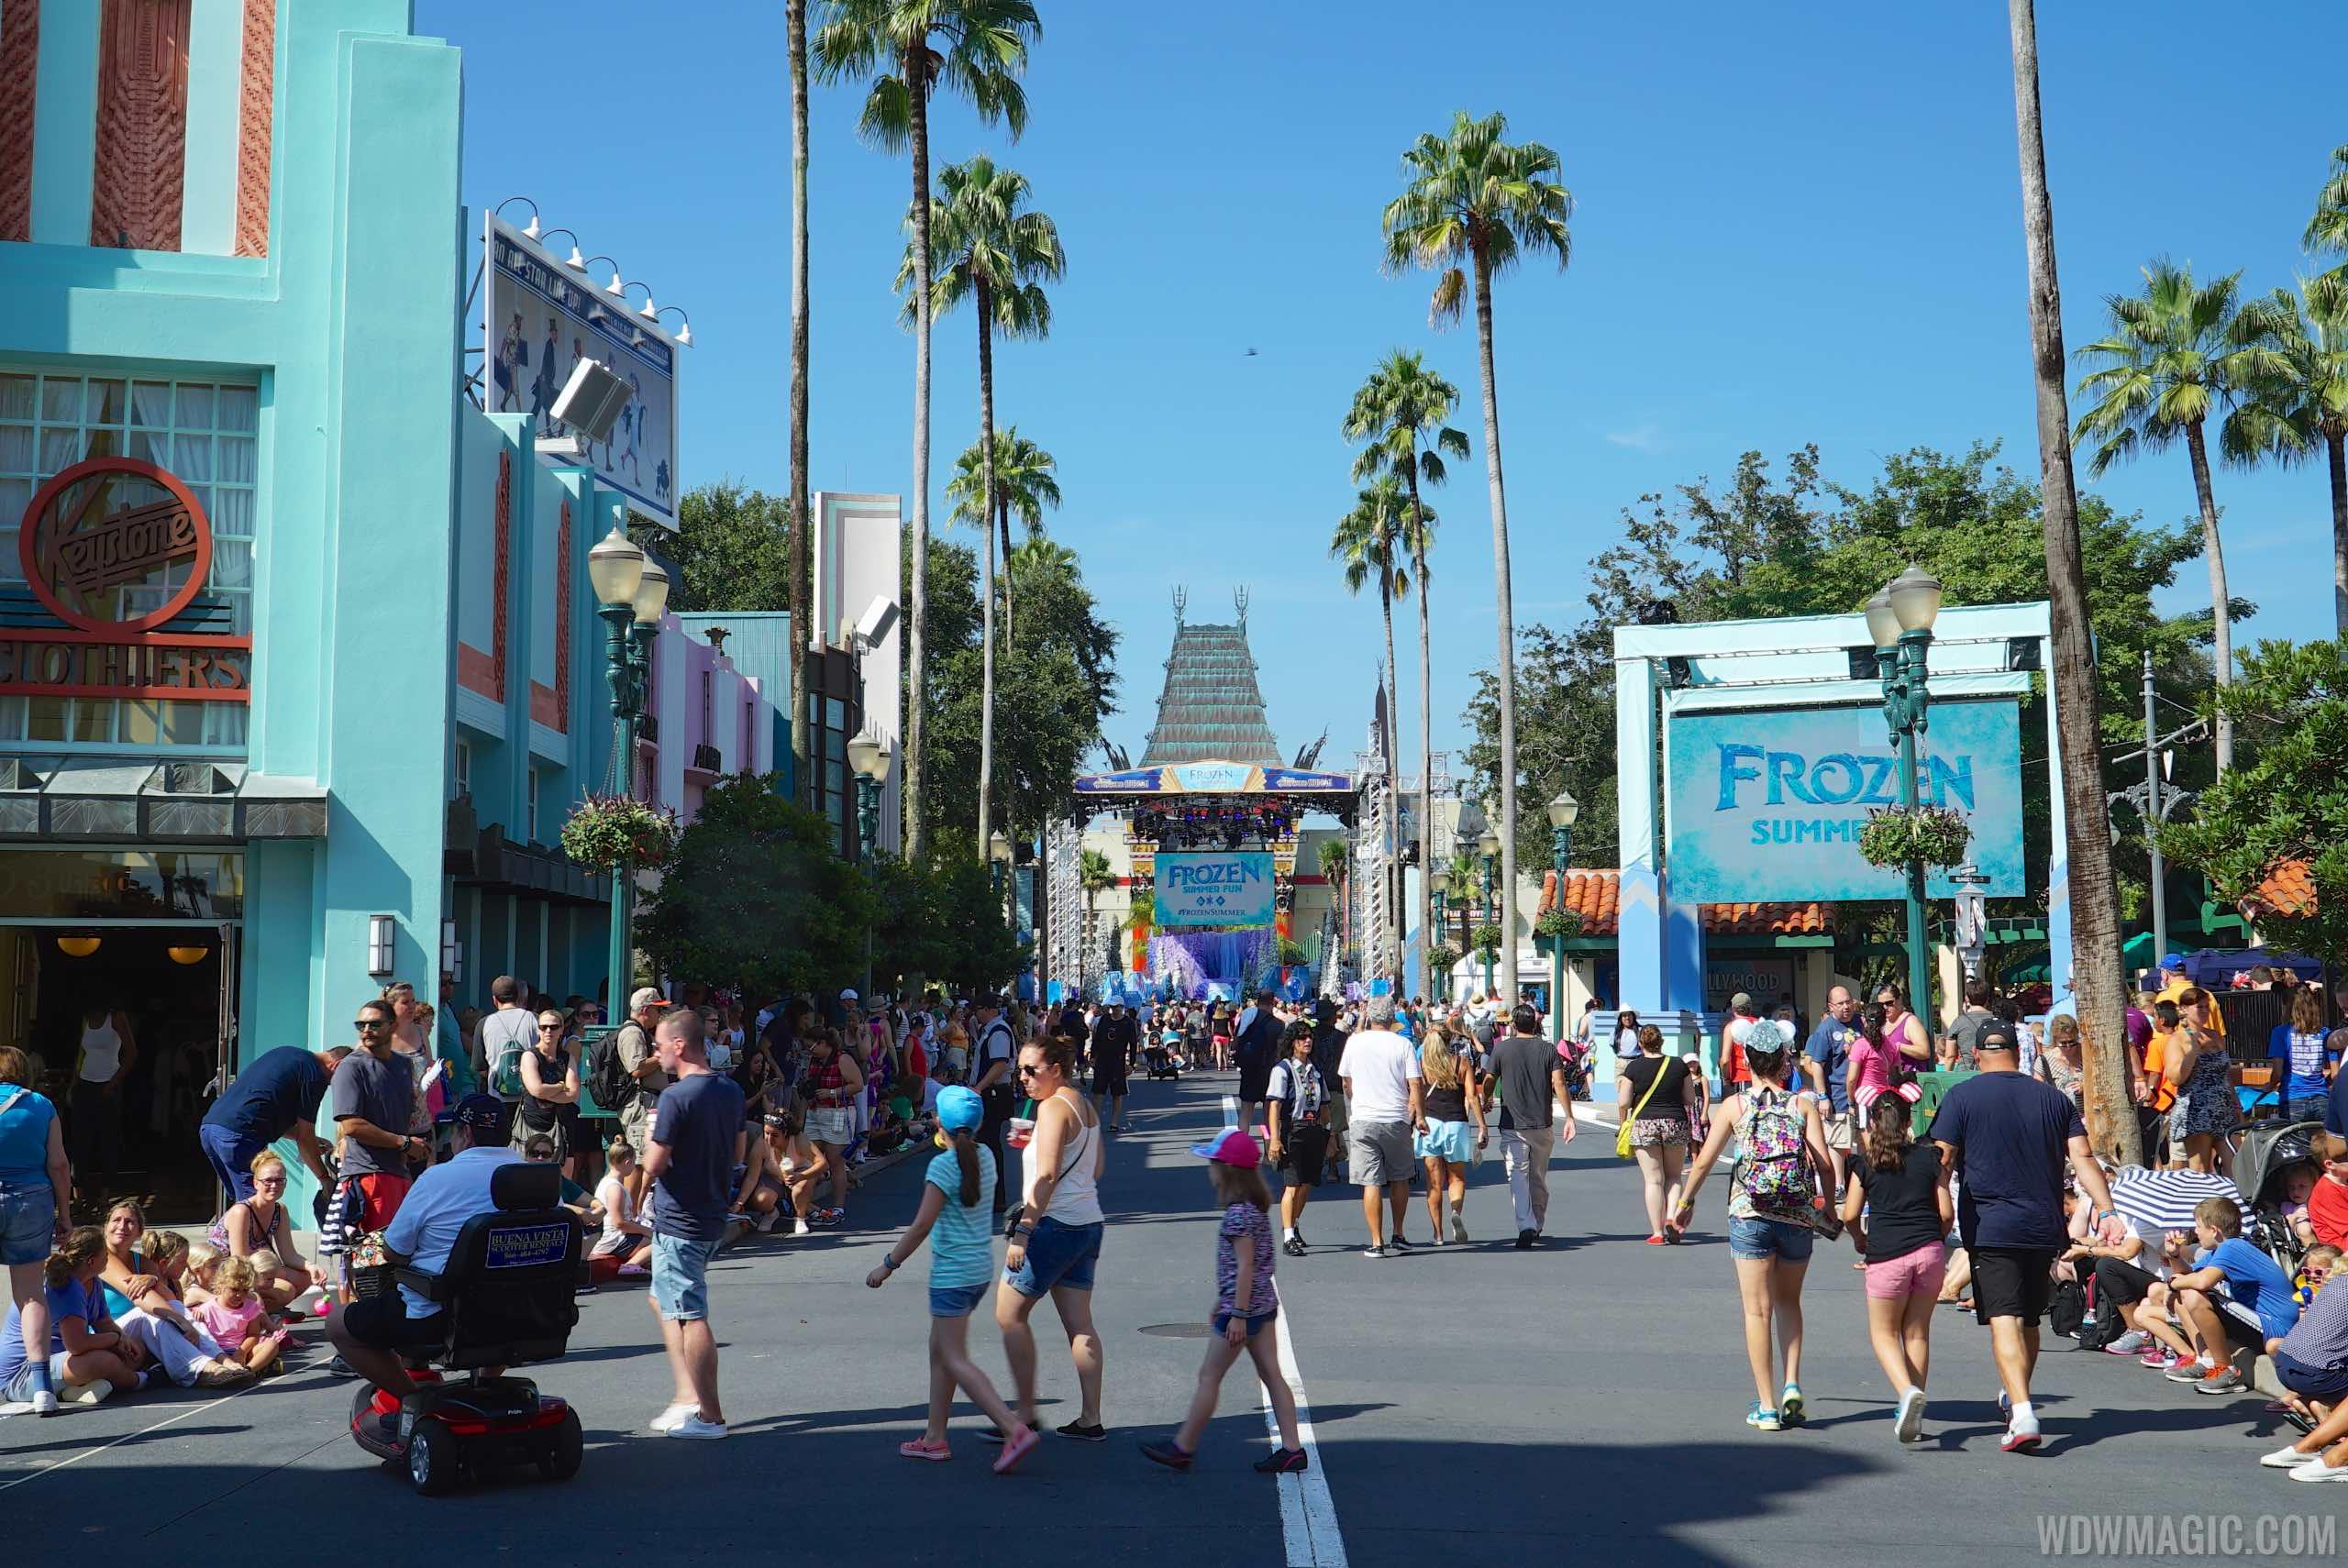 hollywood Blvd at Disney's Hollywood Studios